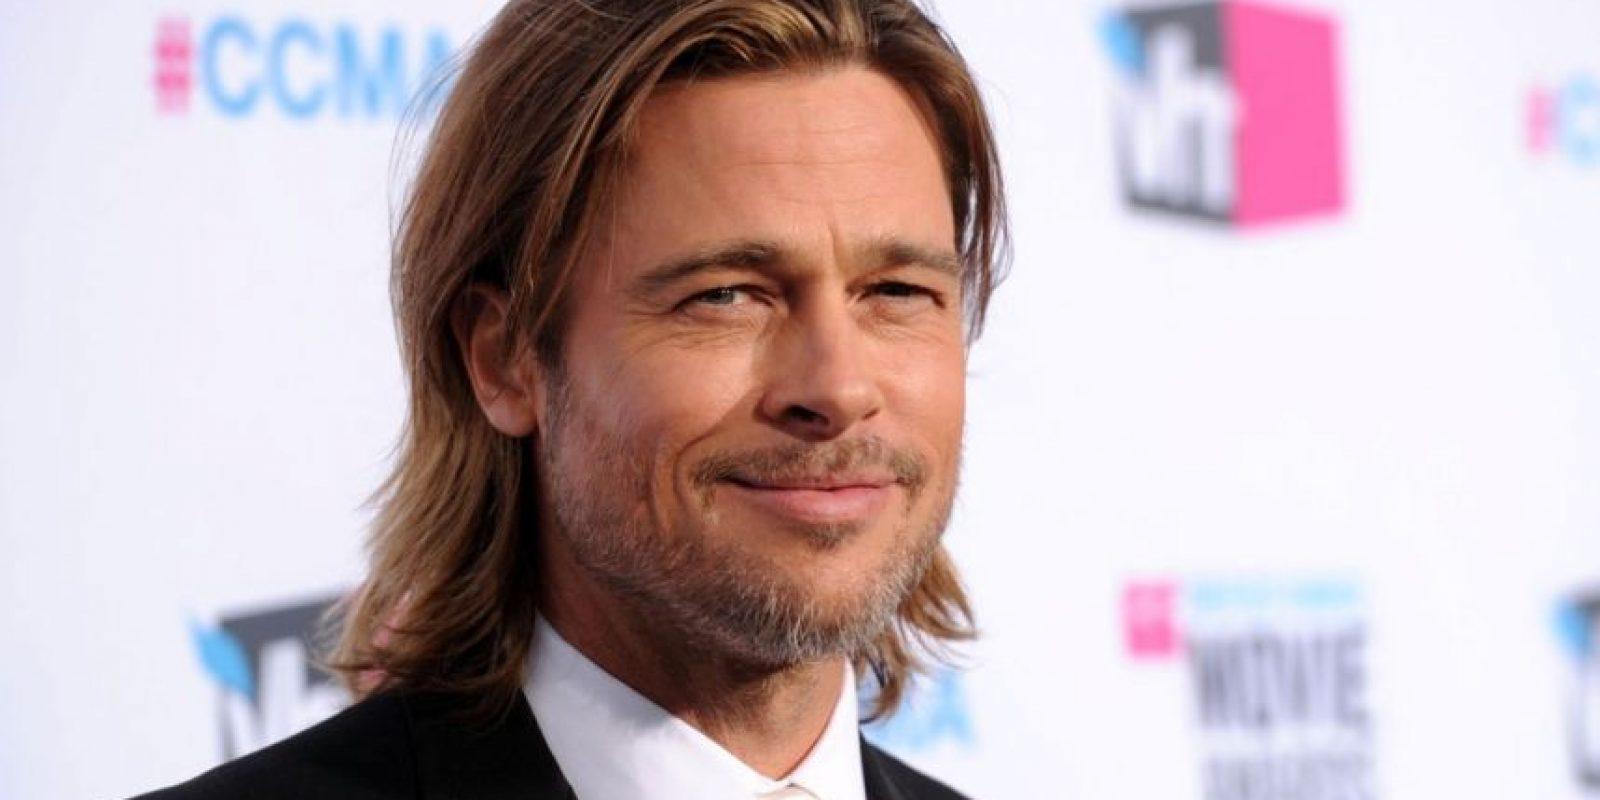 Ha cambiado mucho. Es Brad Pitt Foto:Getty Images